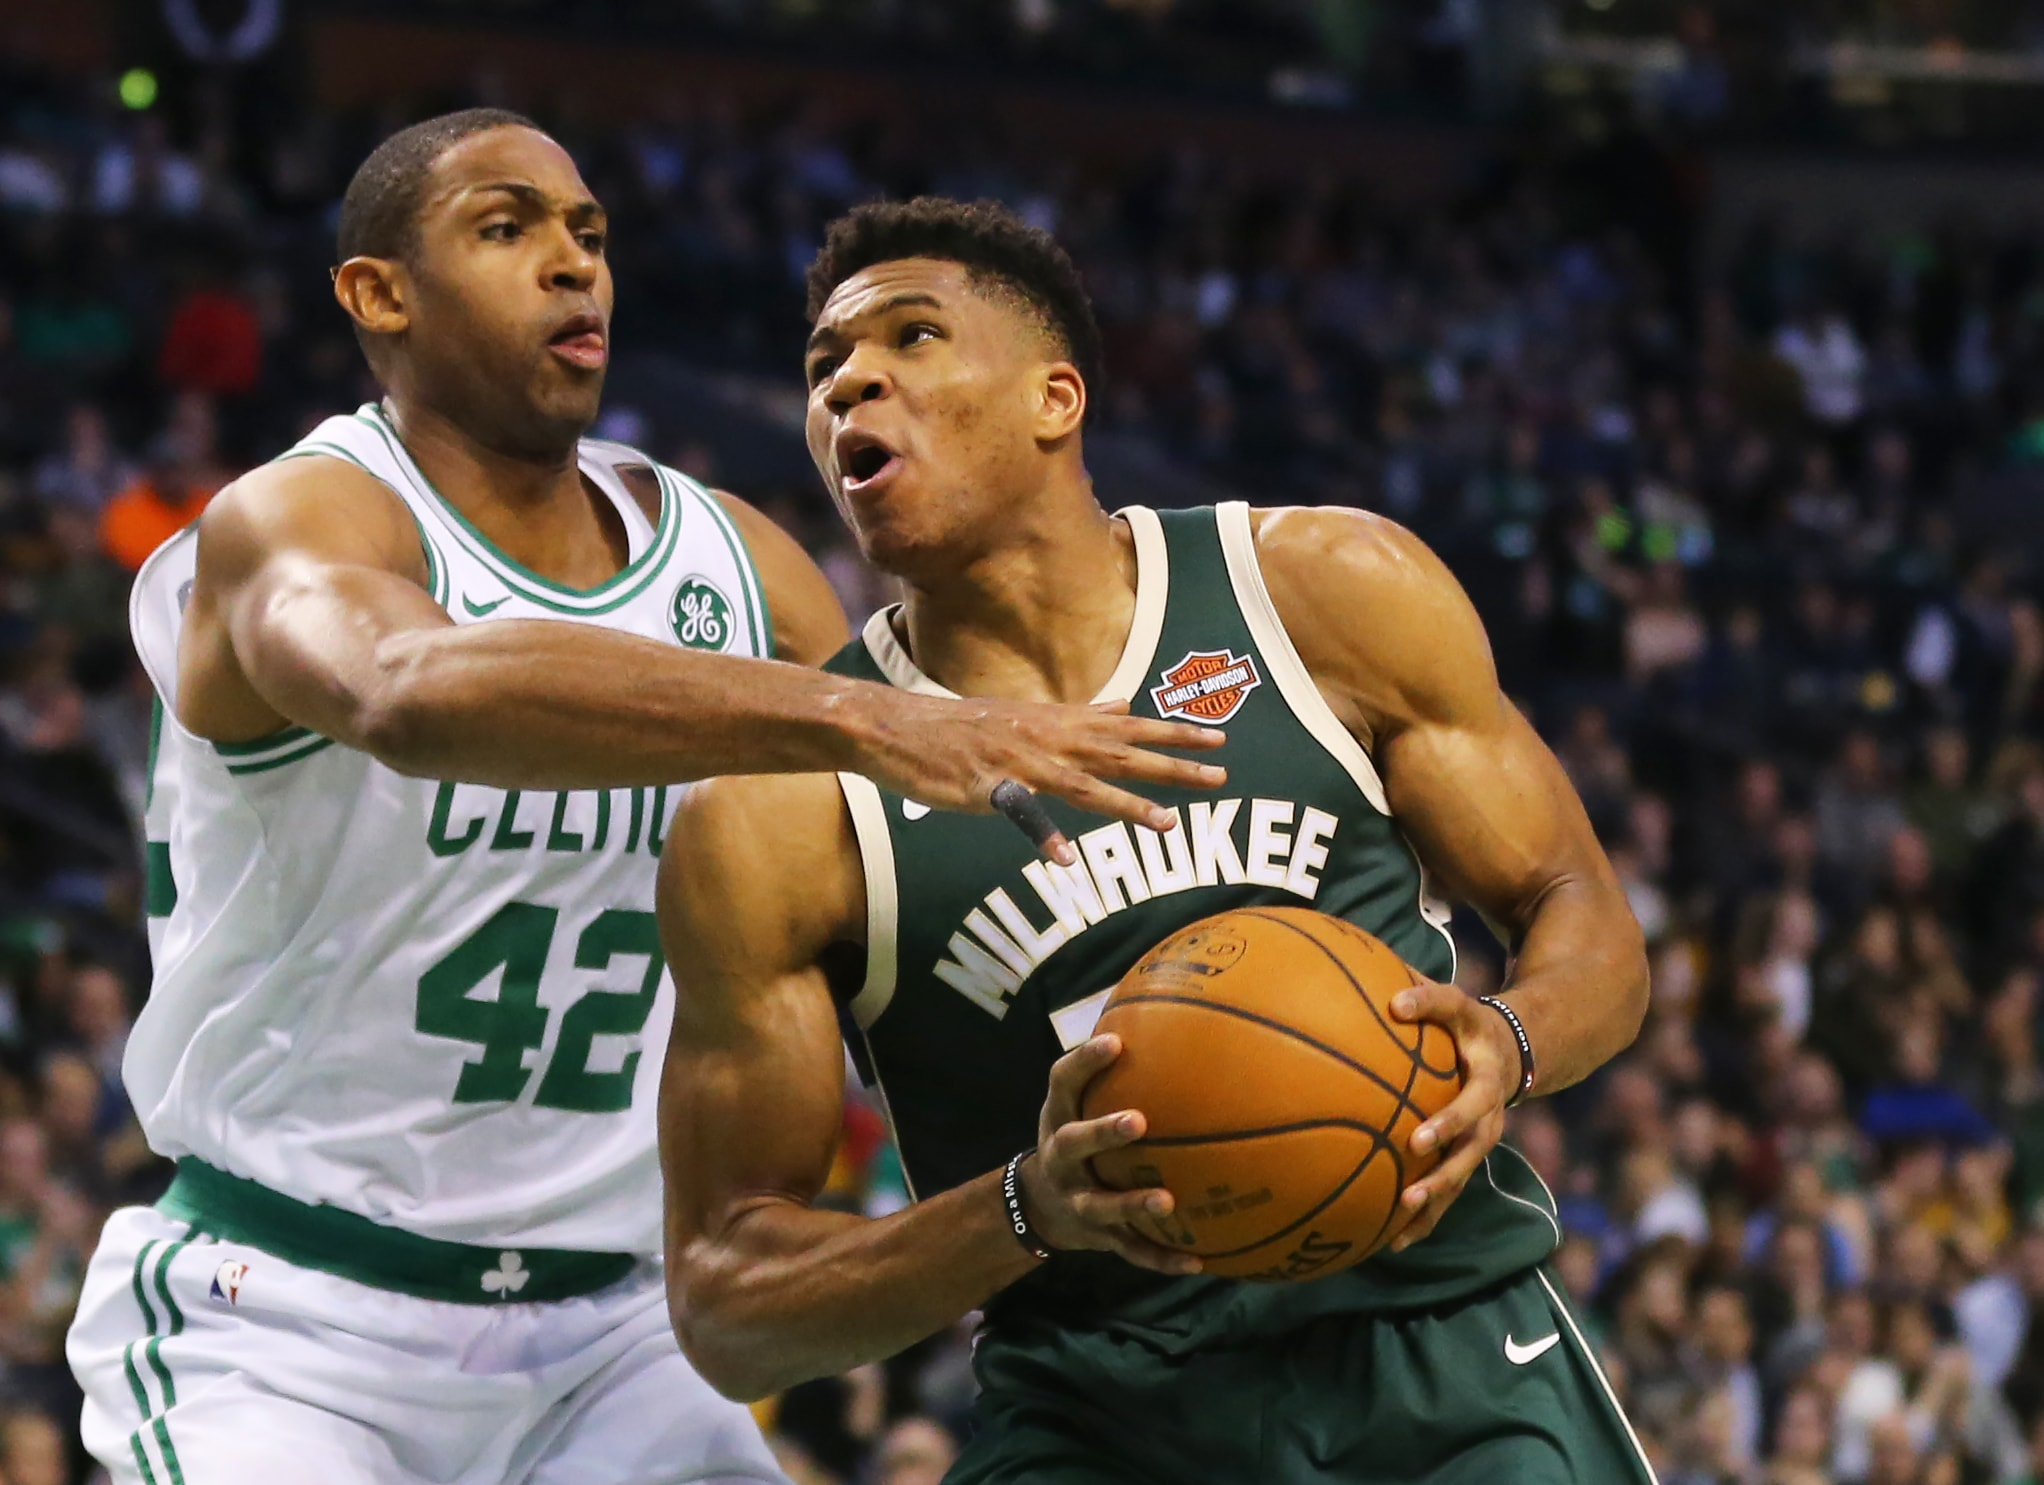 97c5e3202f3d BOSTON - DECEMBER 4  Al Horford of the Celtics defends Giannis  Antetokounmpo of the Bucks during the second quarter at TD Garden on  December 4